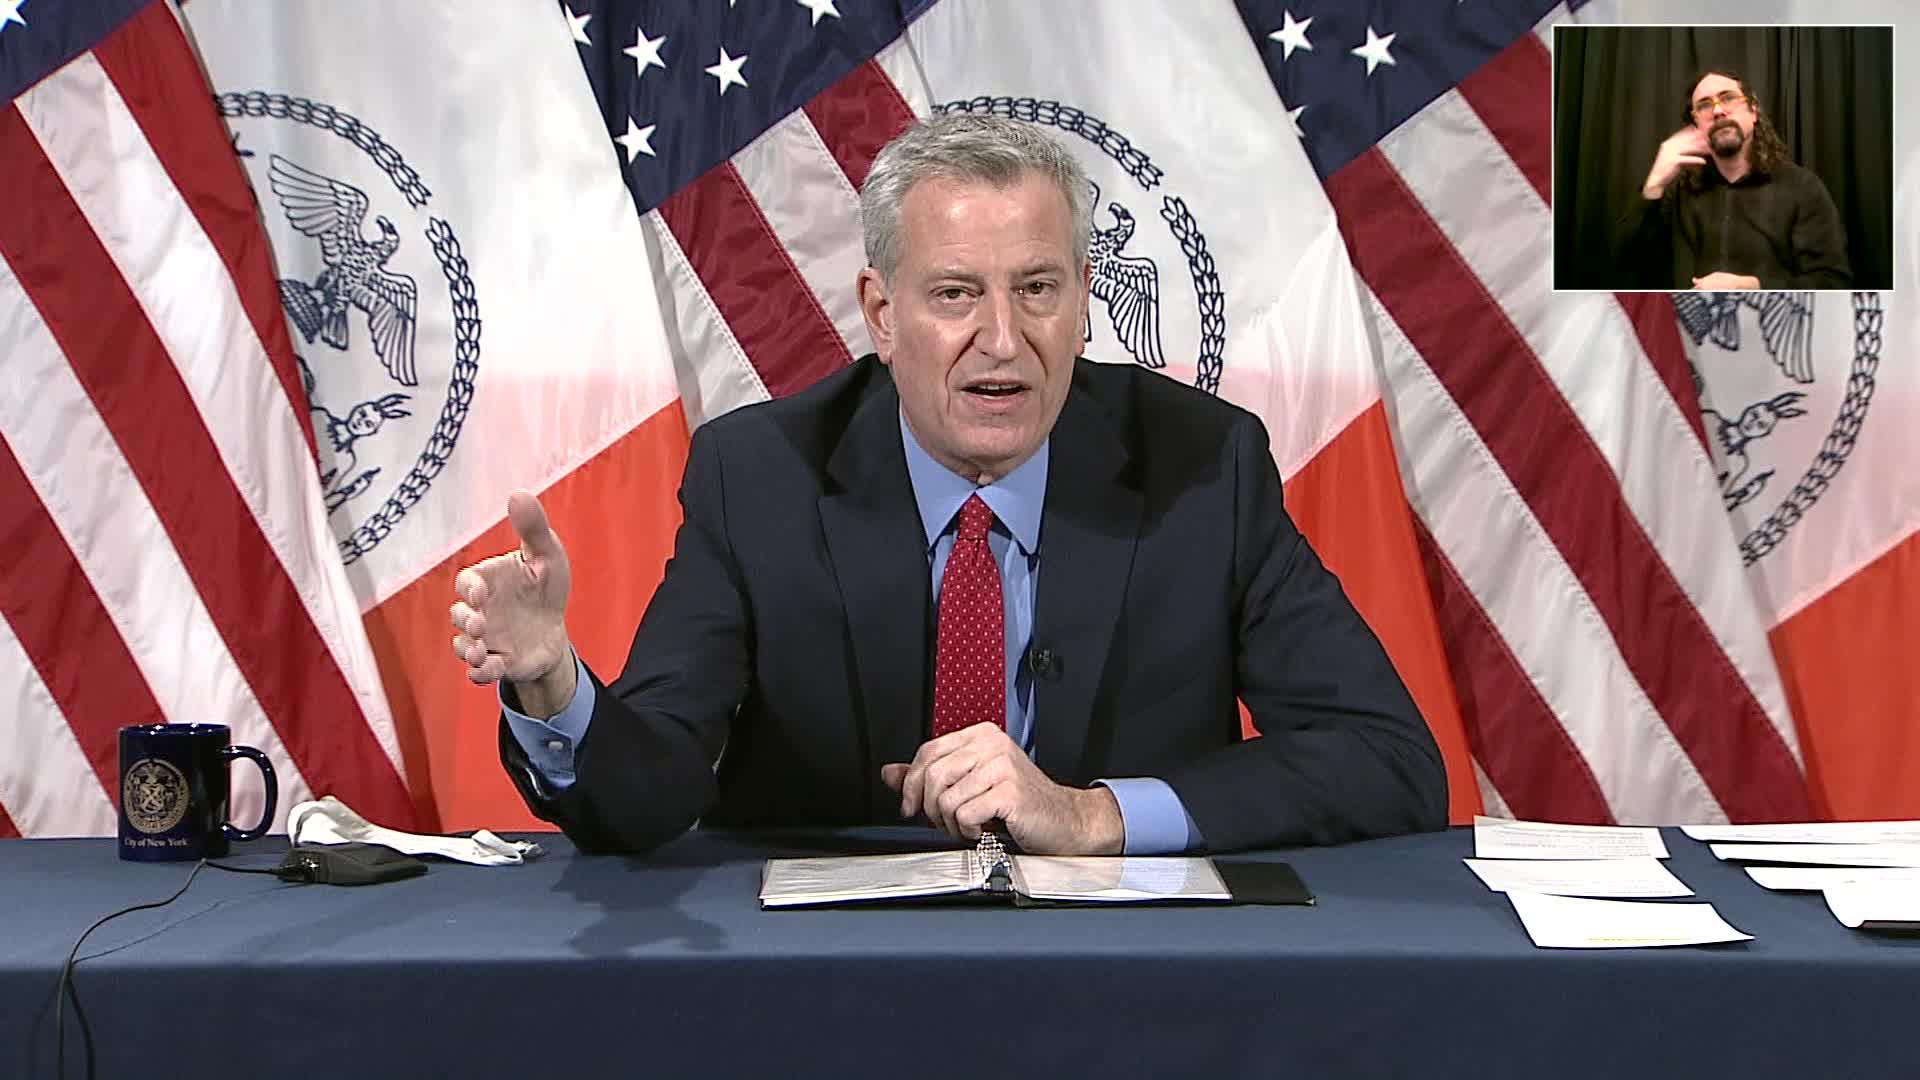 New York City Mayor Bill de Blasio speaks during a press briefing in New York on January 8.